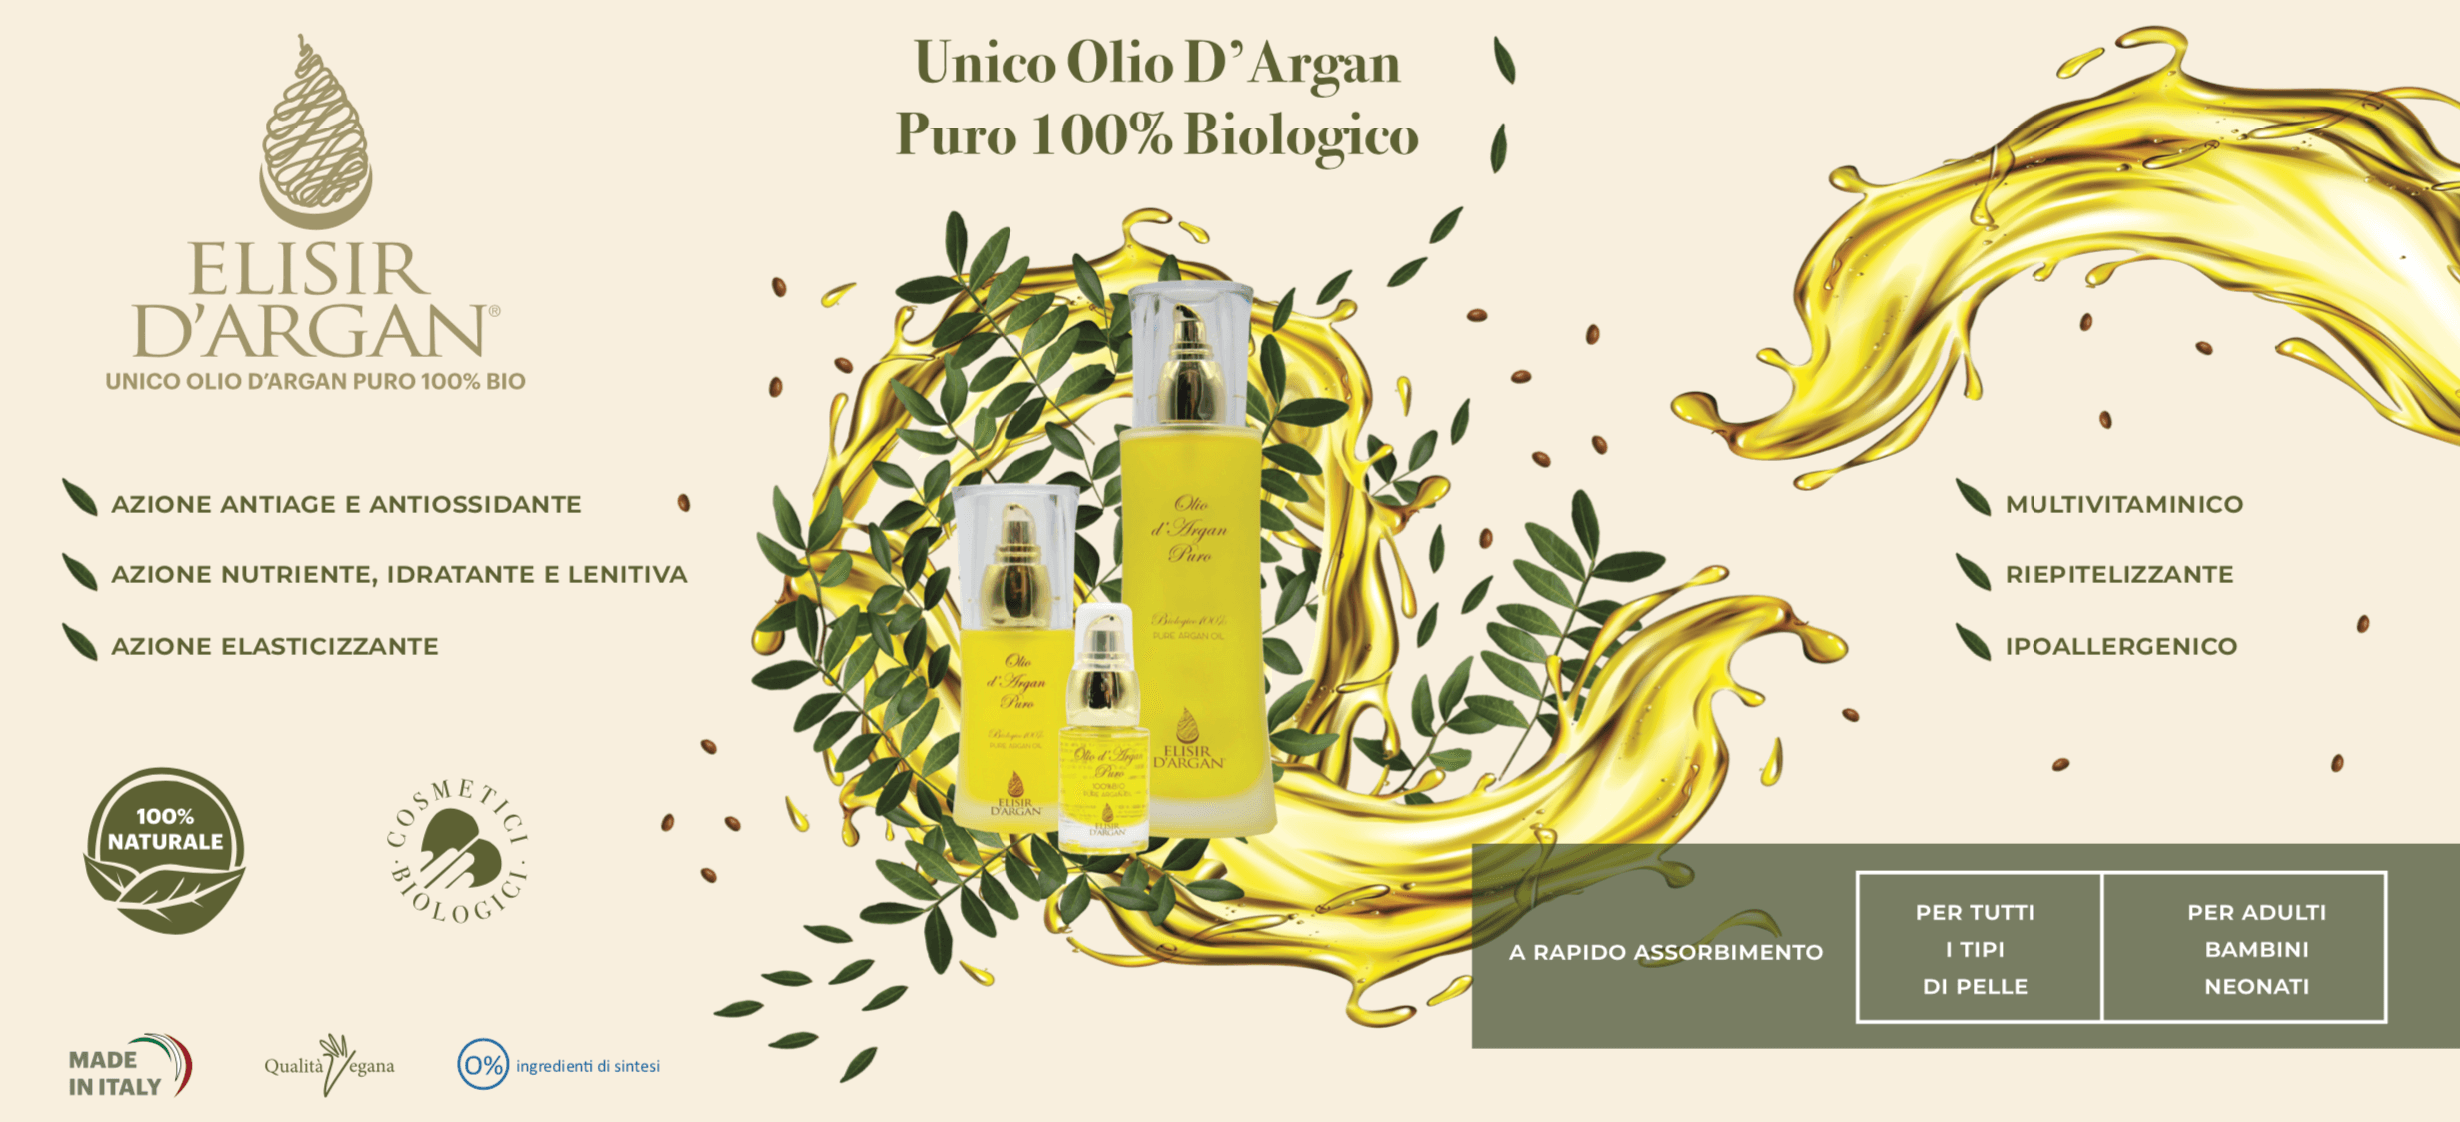 Prodotti di bellezza olio d'argan | Elisirdargan.com